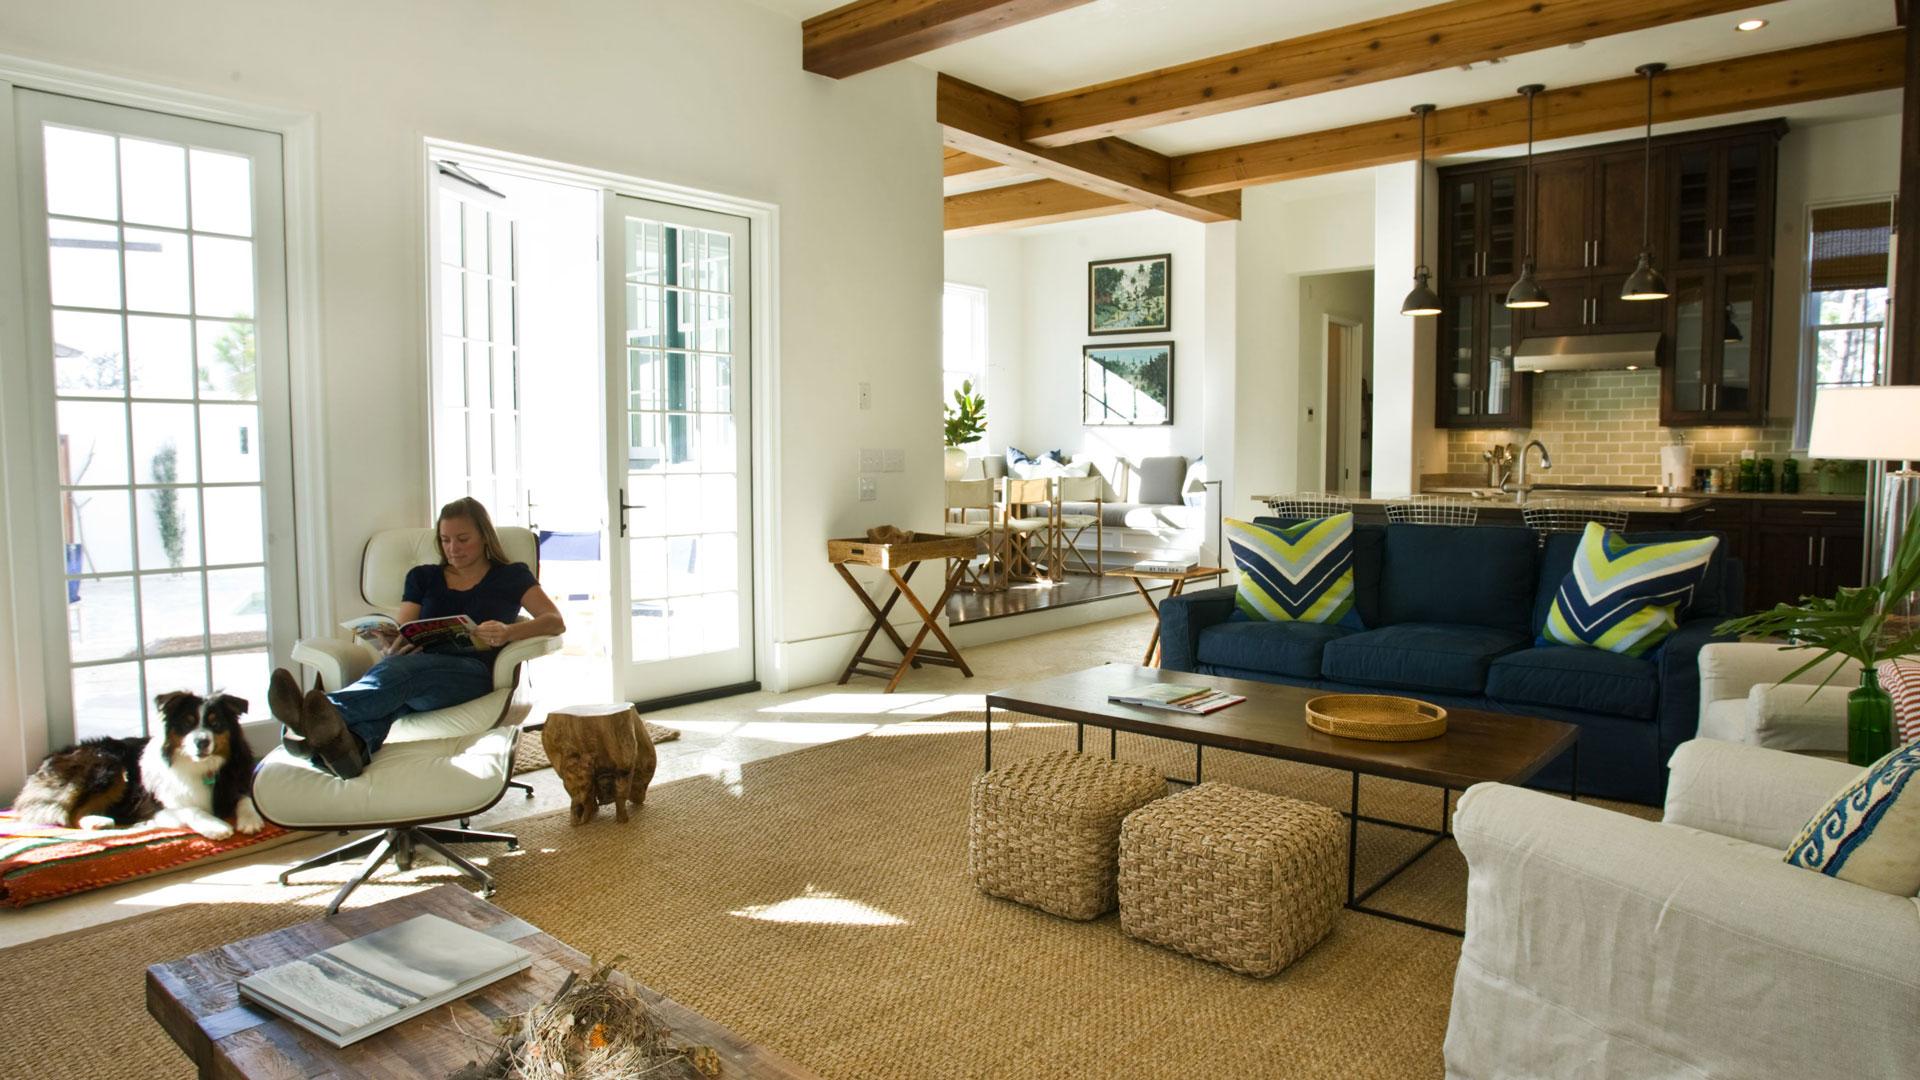 alys design interior design pittsboro nc stylish functional sustainable interior design. Black Bedroom Furniture Sets. Home Design Ideas